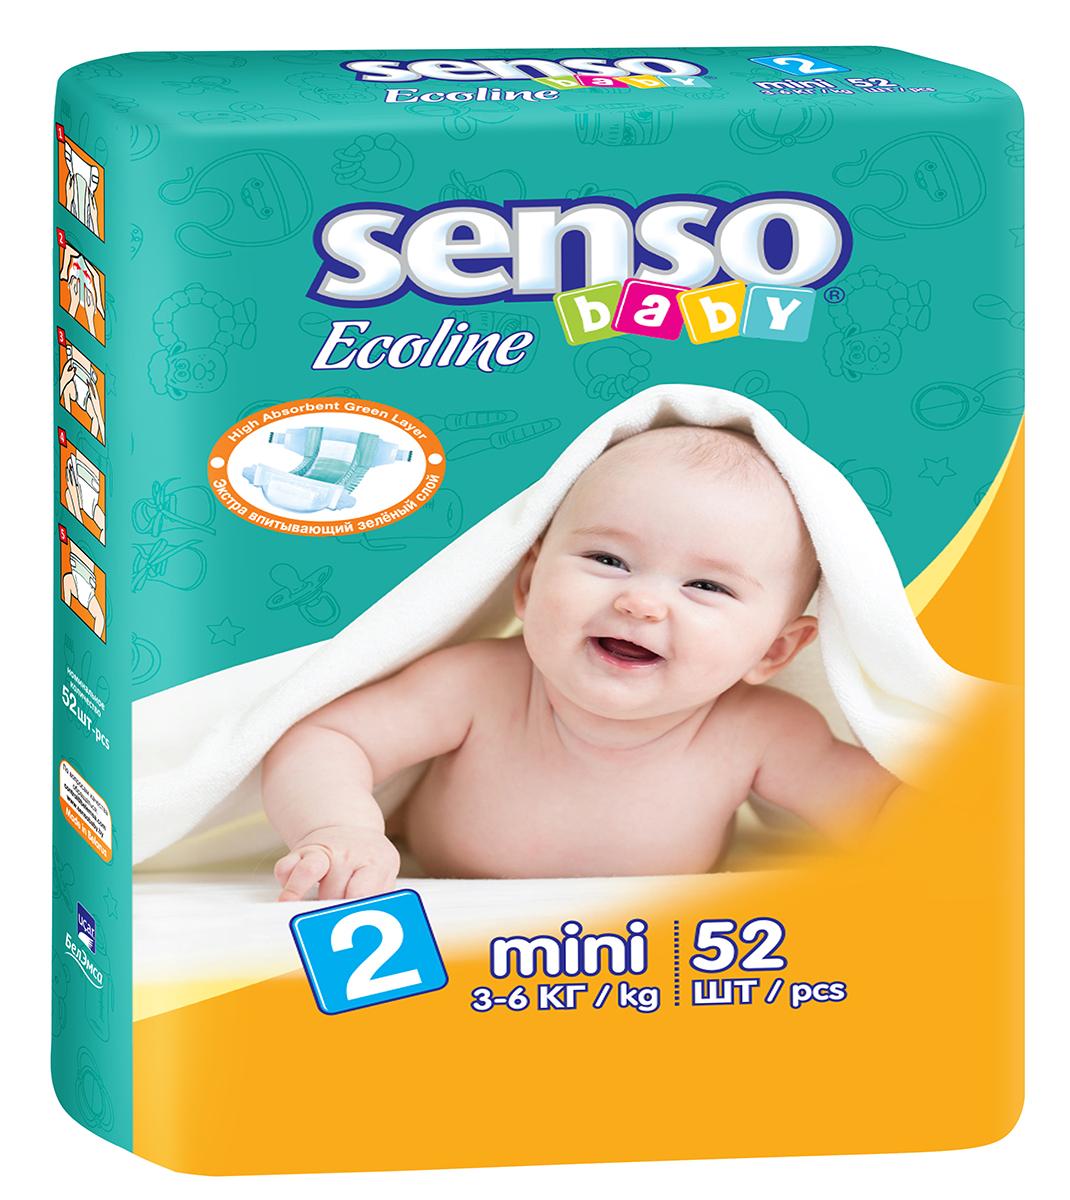 Senso Baby Ecoline Подгузники детские Mini 3-6 кг 52 шт300090